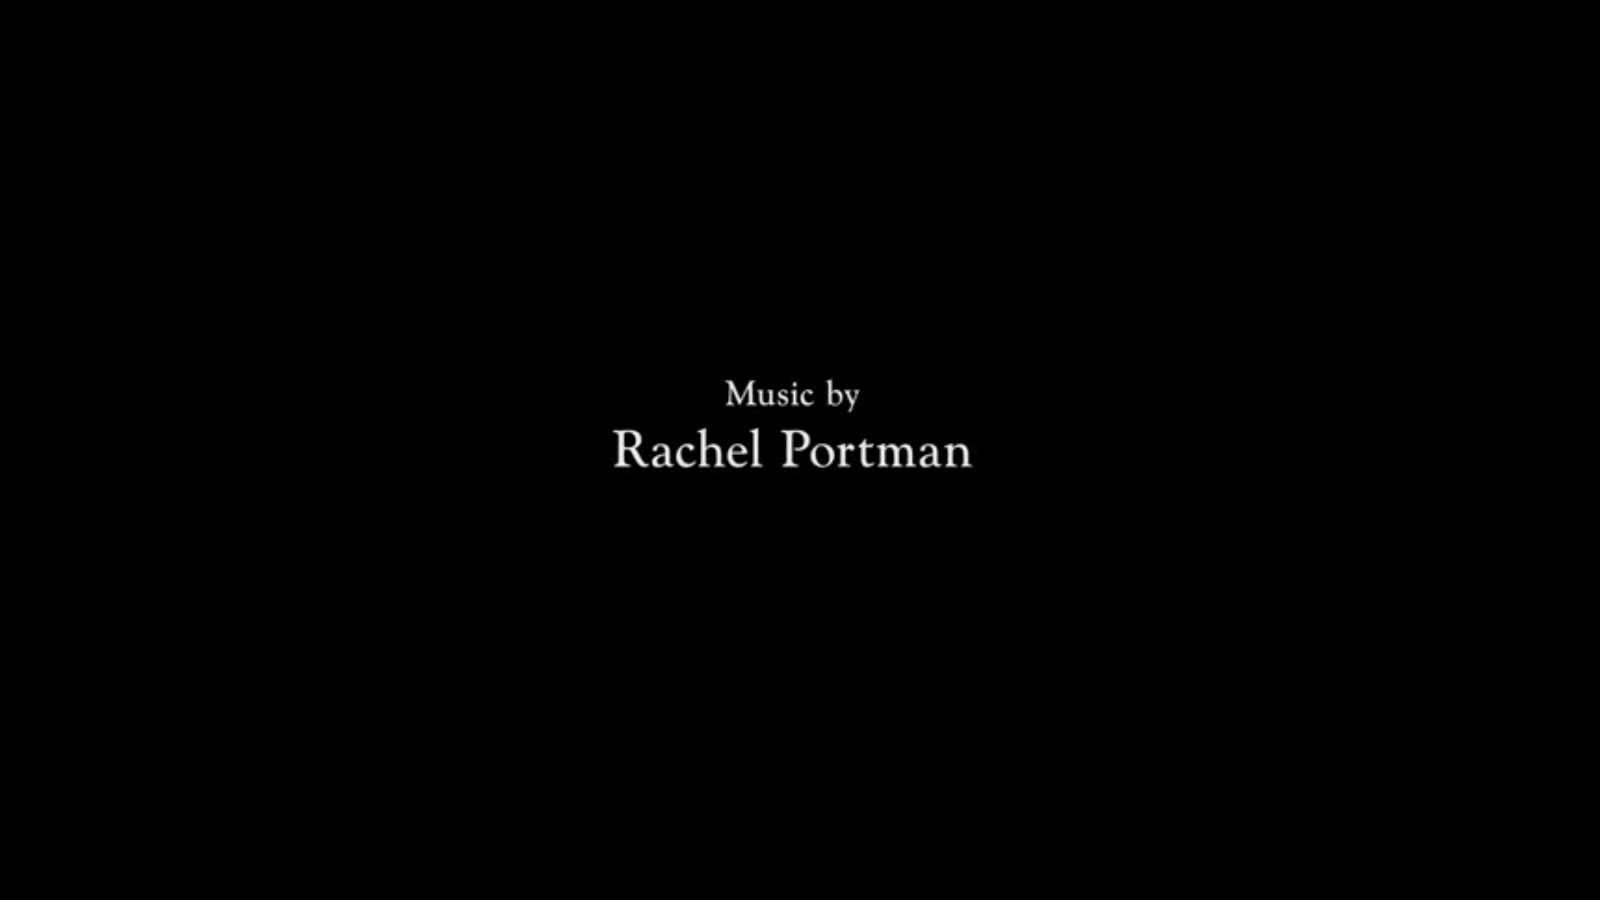 THE COMPOSER CREDITS PROJECT: RACHEL PORTMAN